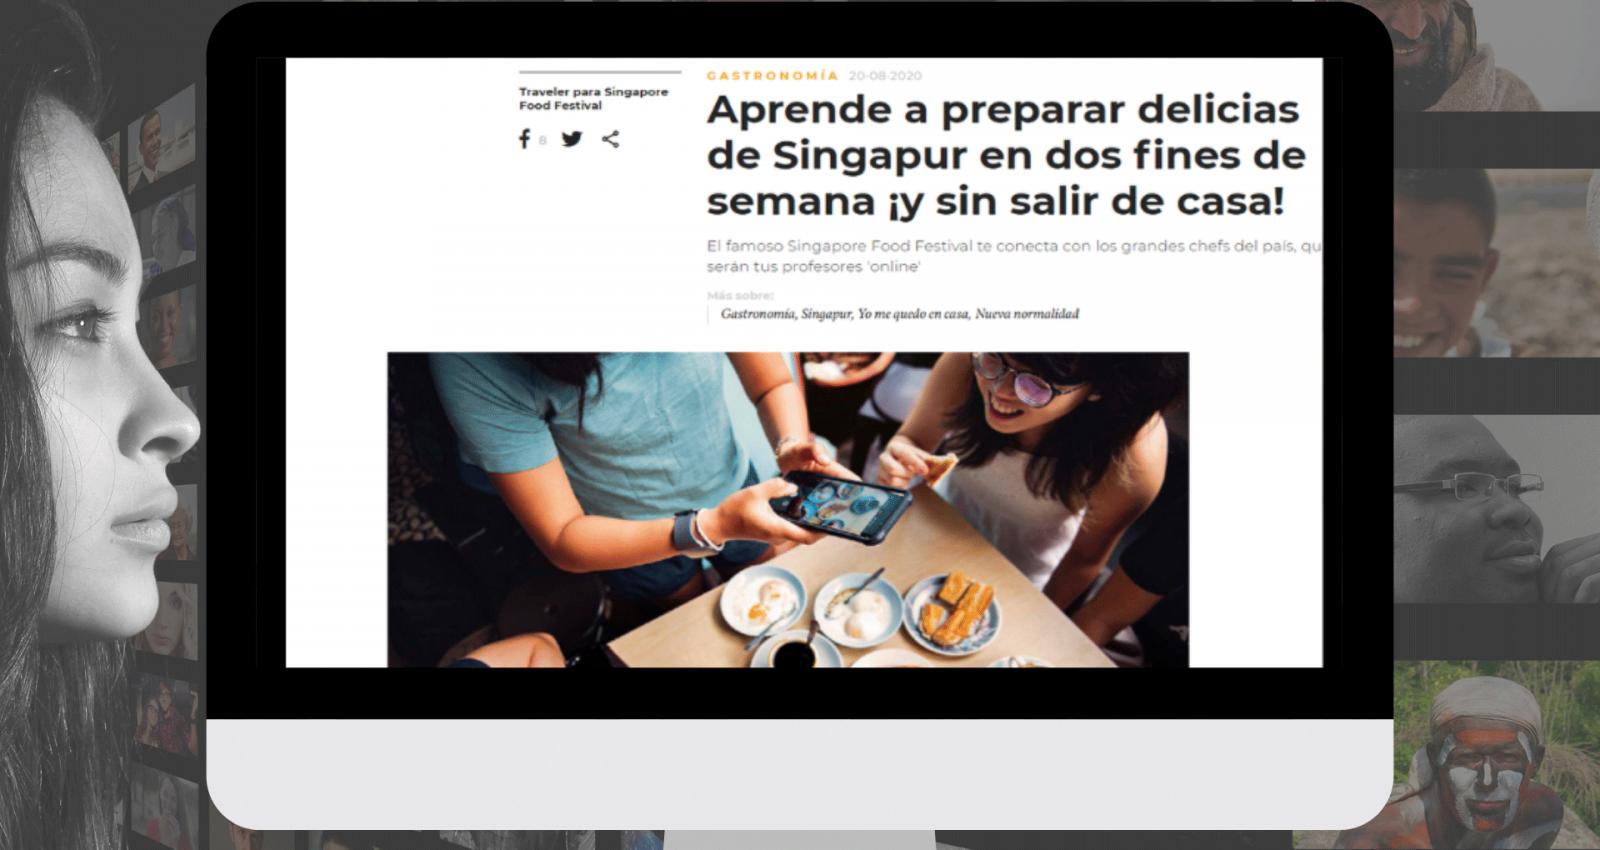 articulo-conde-nast-traveler-singapore-food-festival